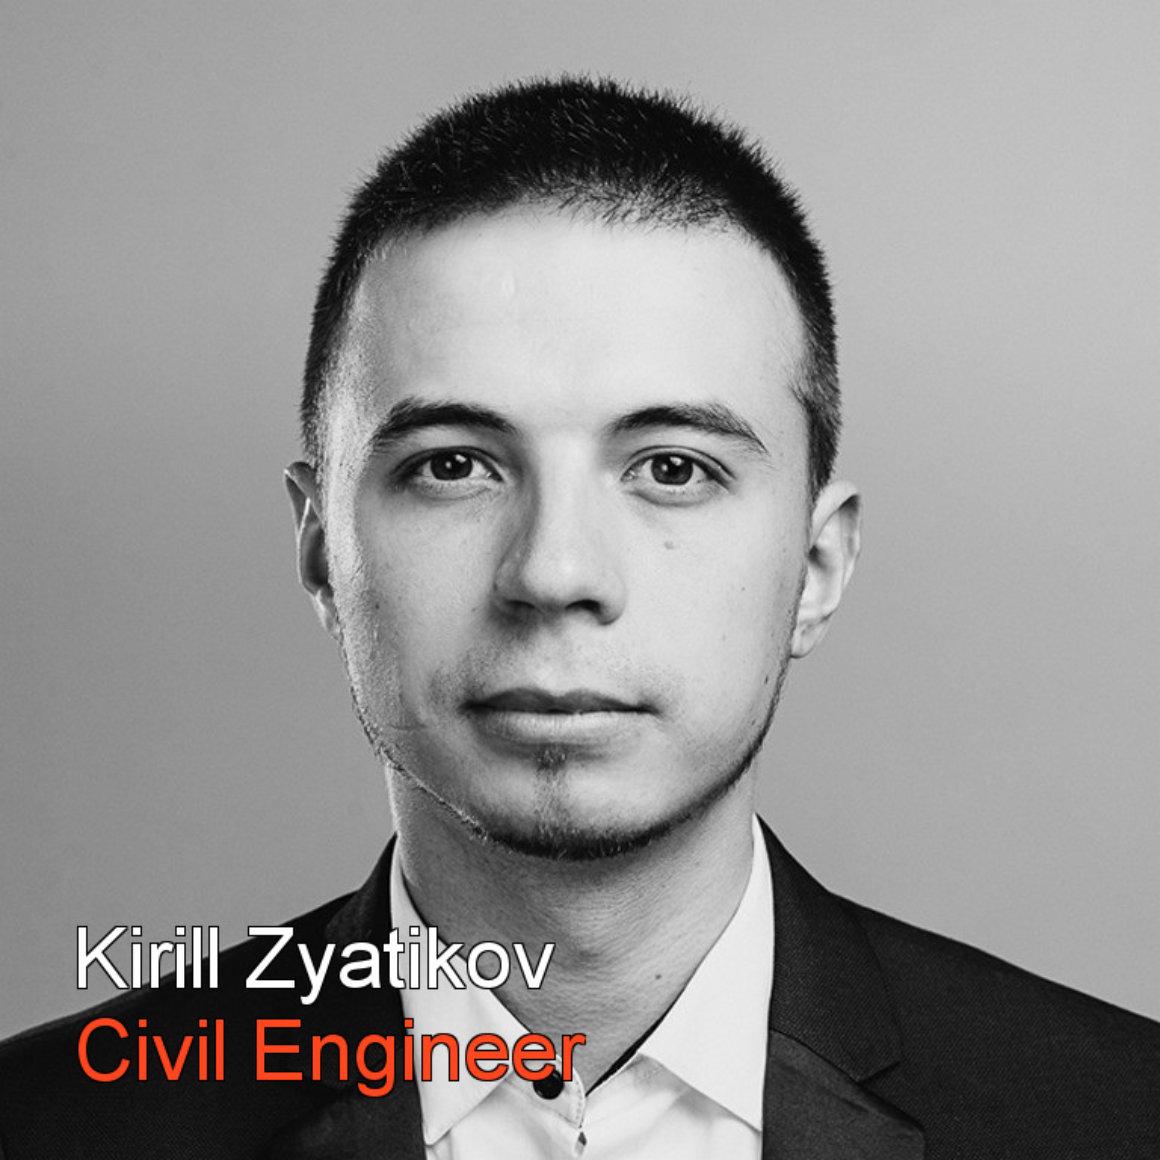 Kirill Zyatikov Civil Engeneer bw